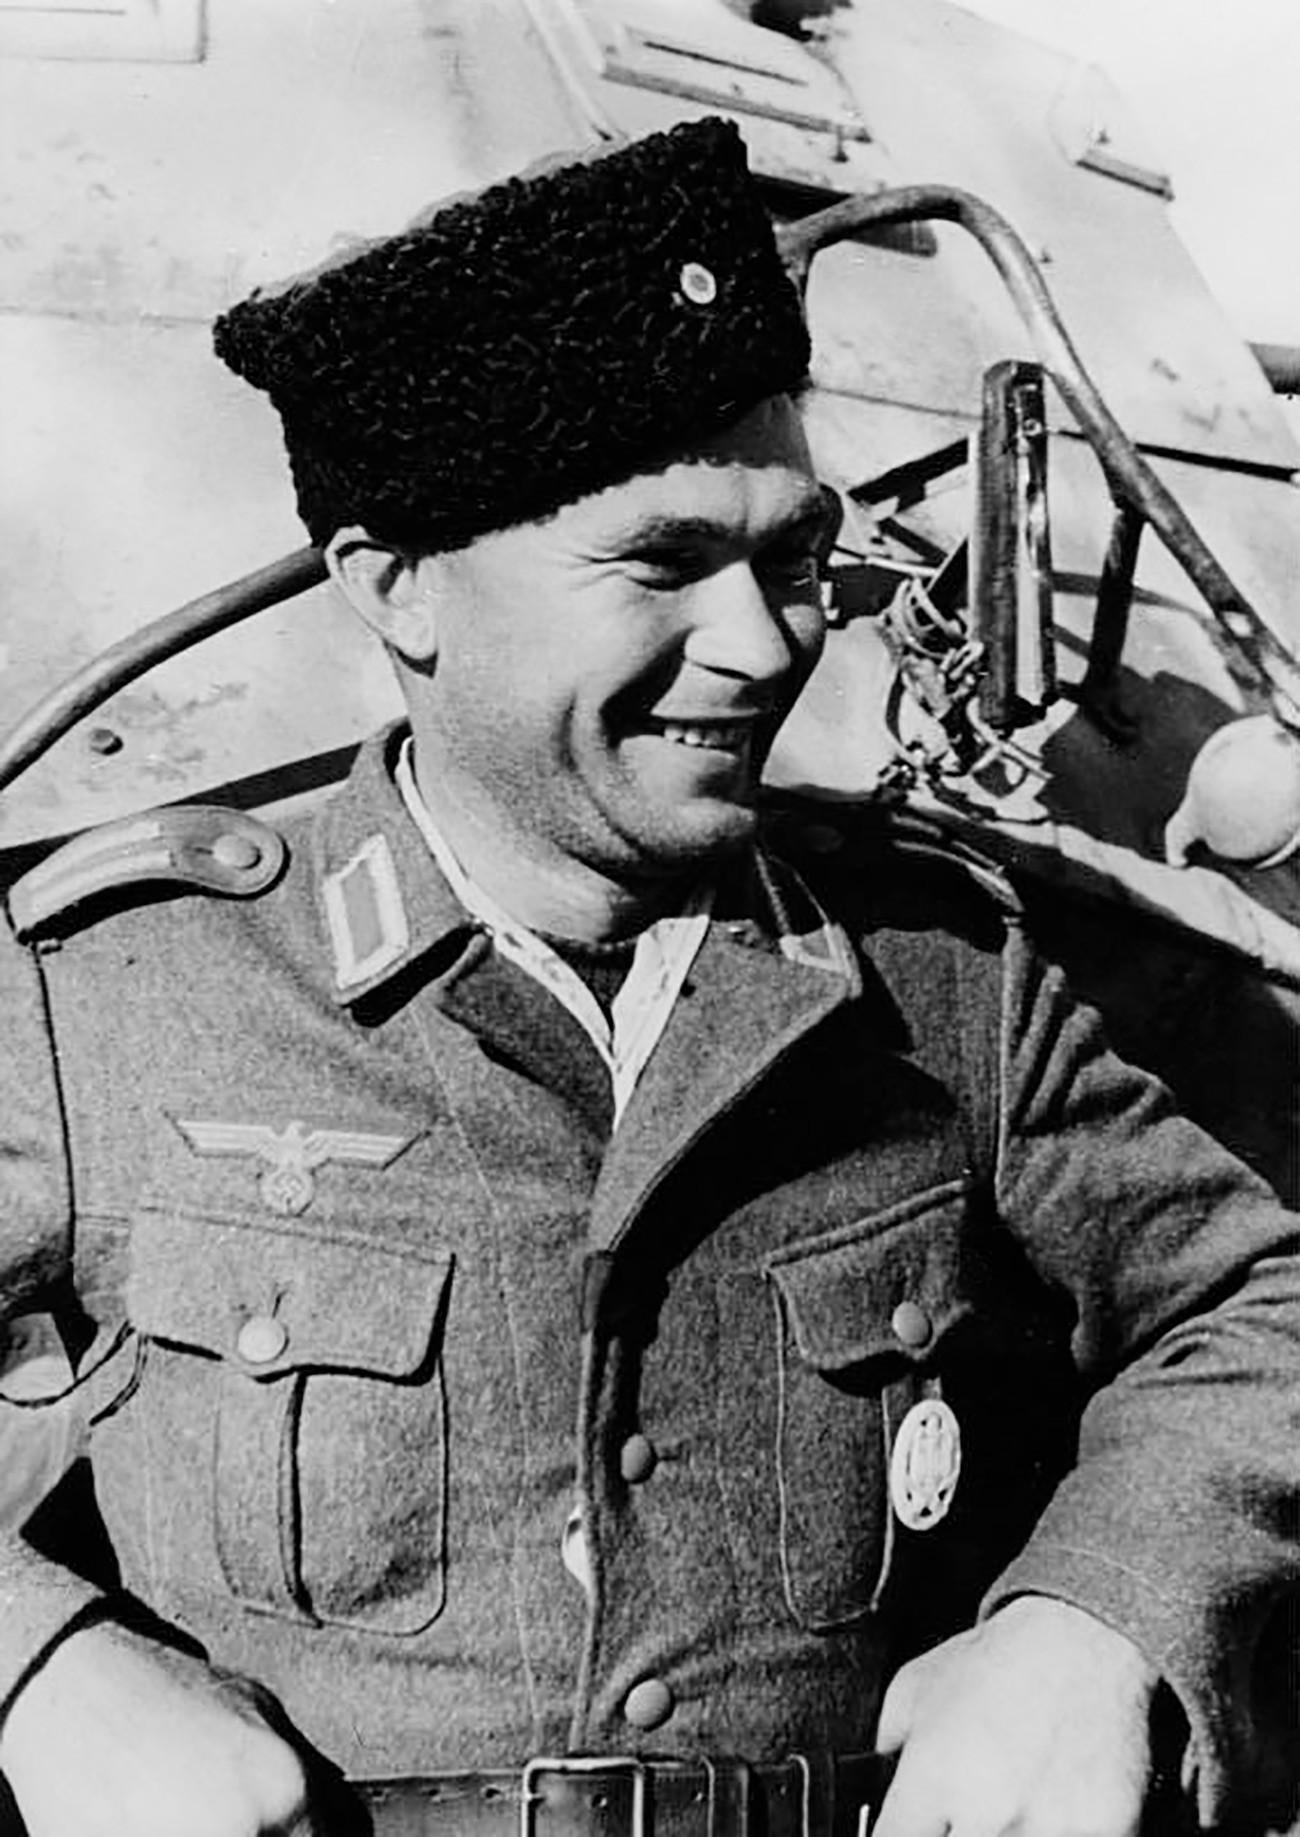 Russie, Cosaques dans la Wehrmacht